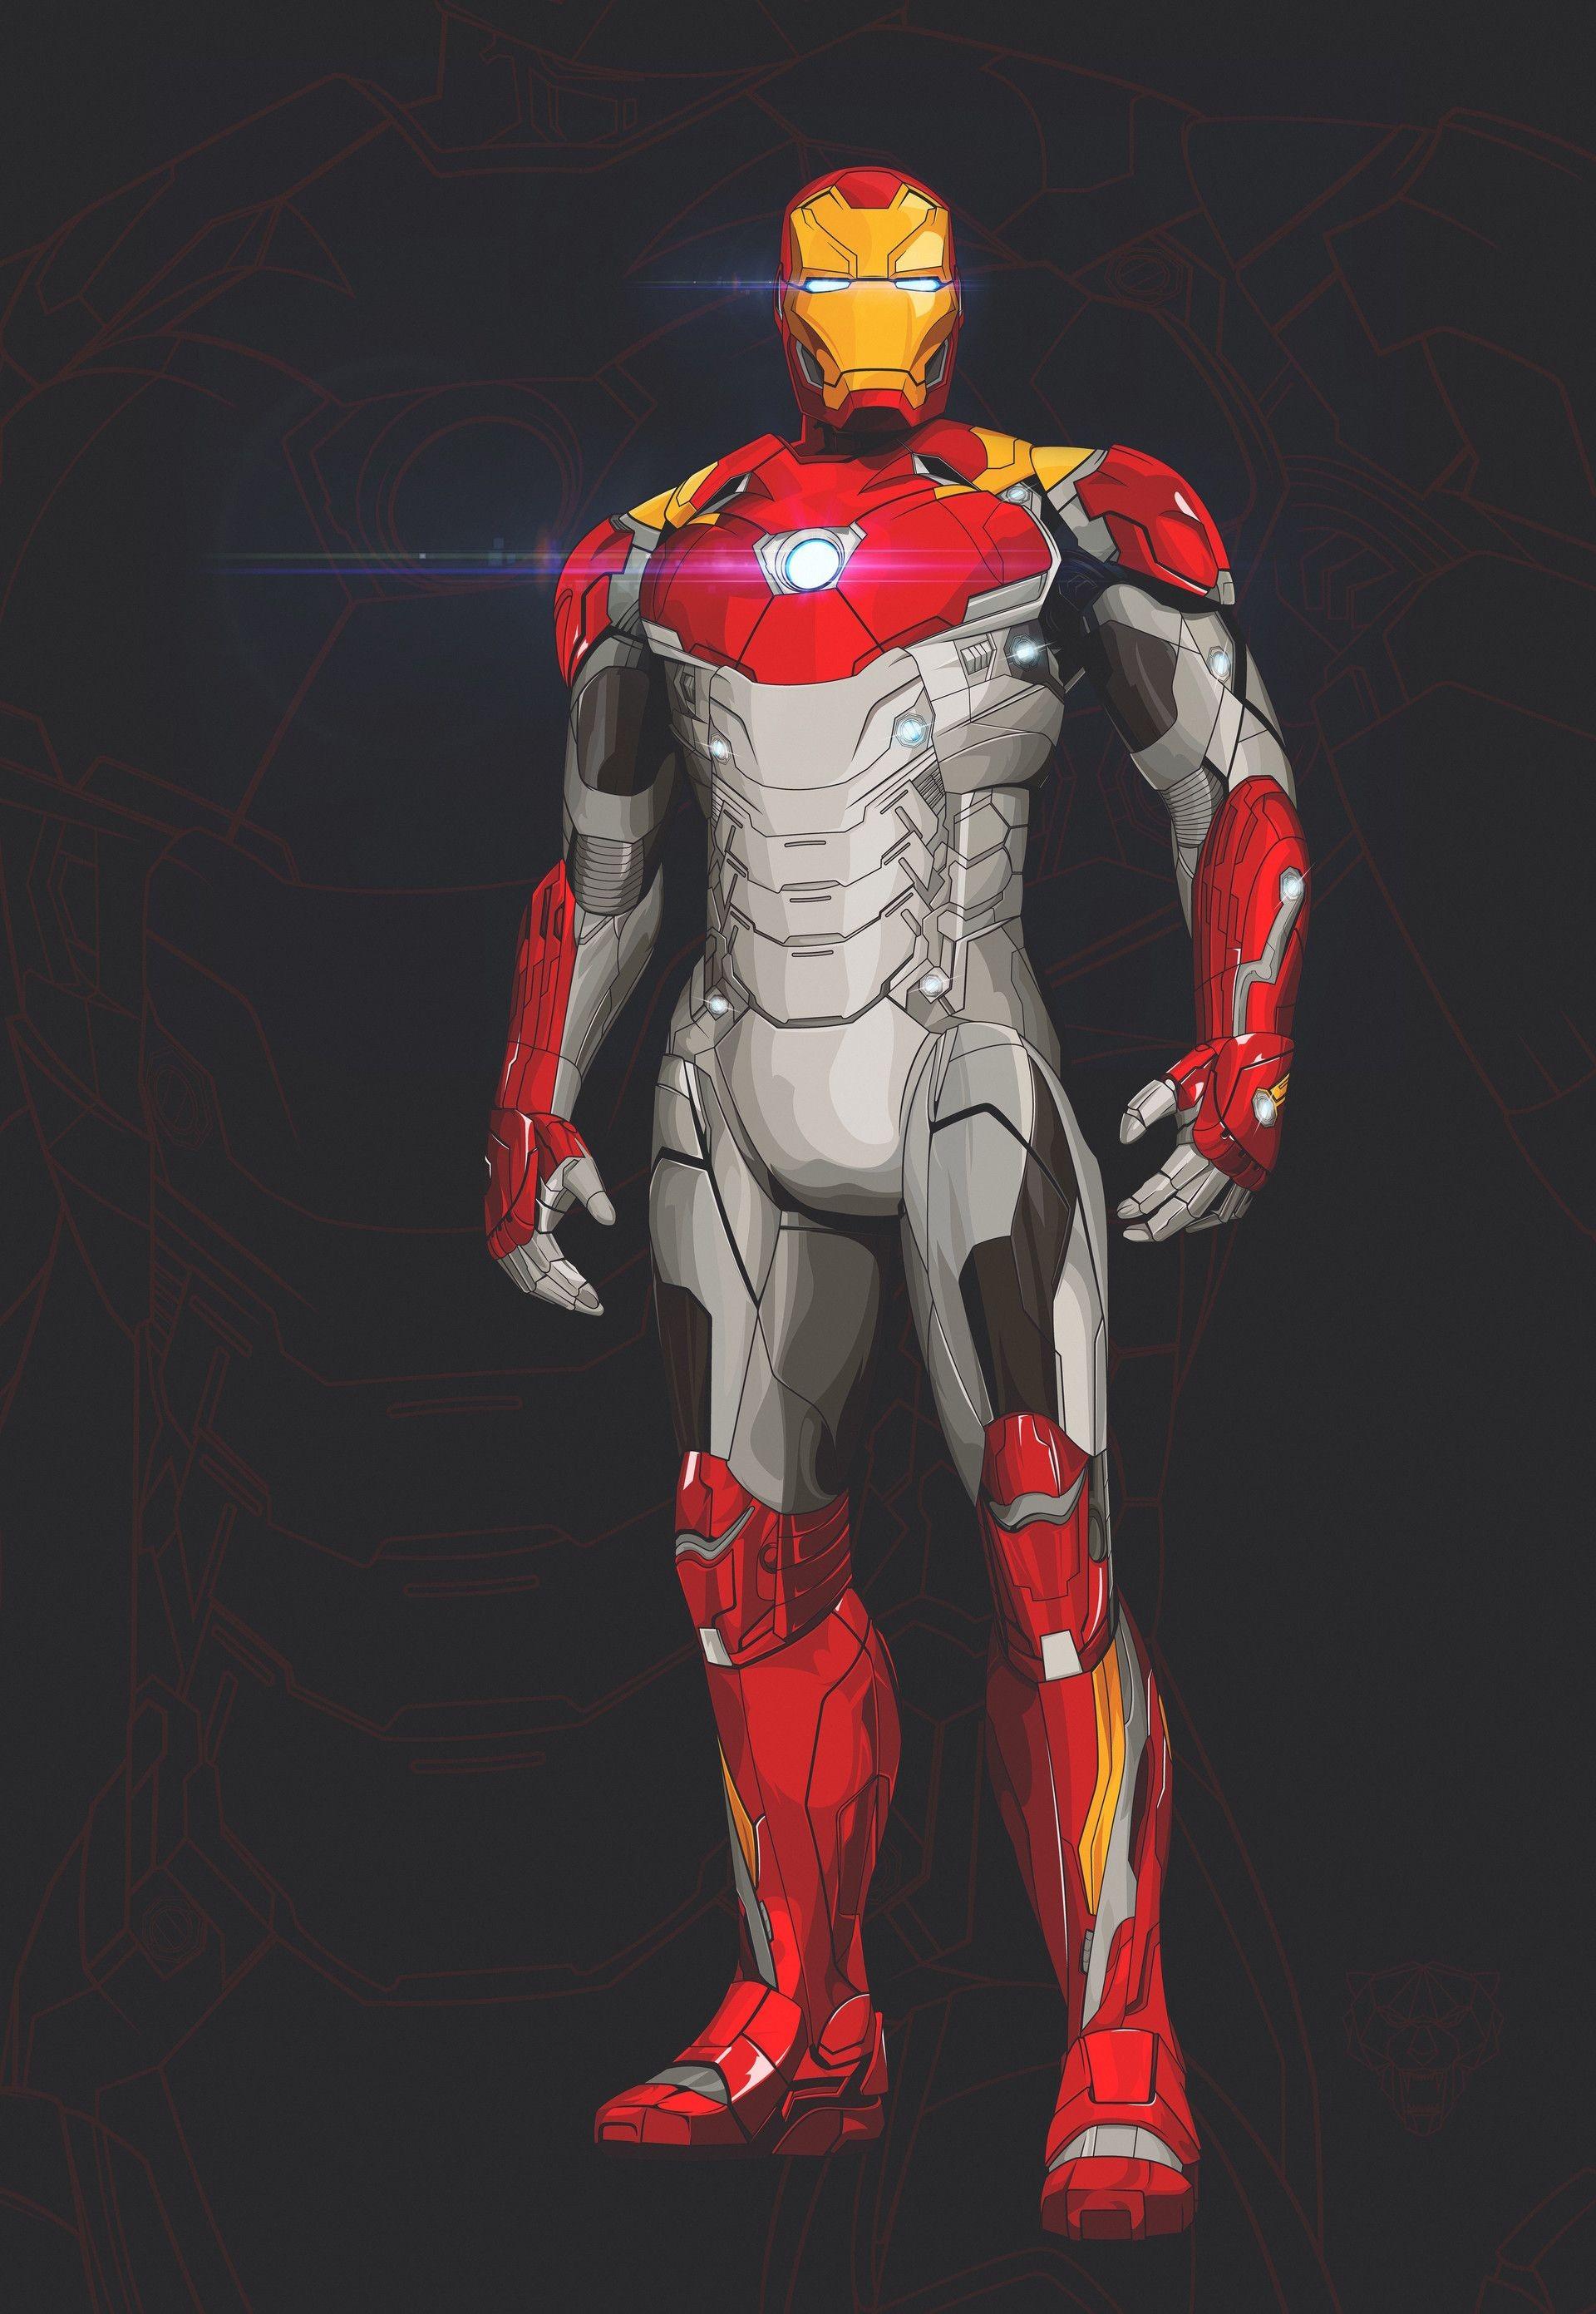 Iron Man Papercraft Iron Man Mark 47 Marvel & Dc Ics Pinterest